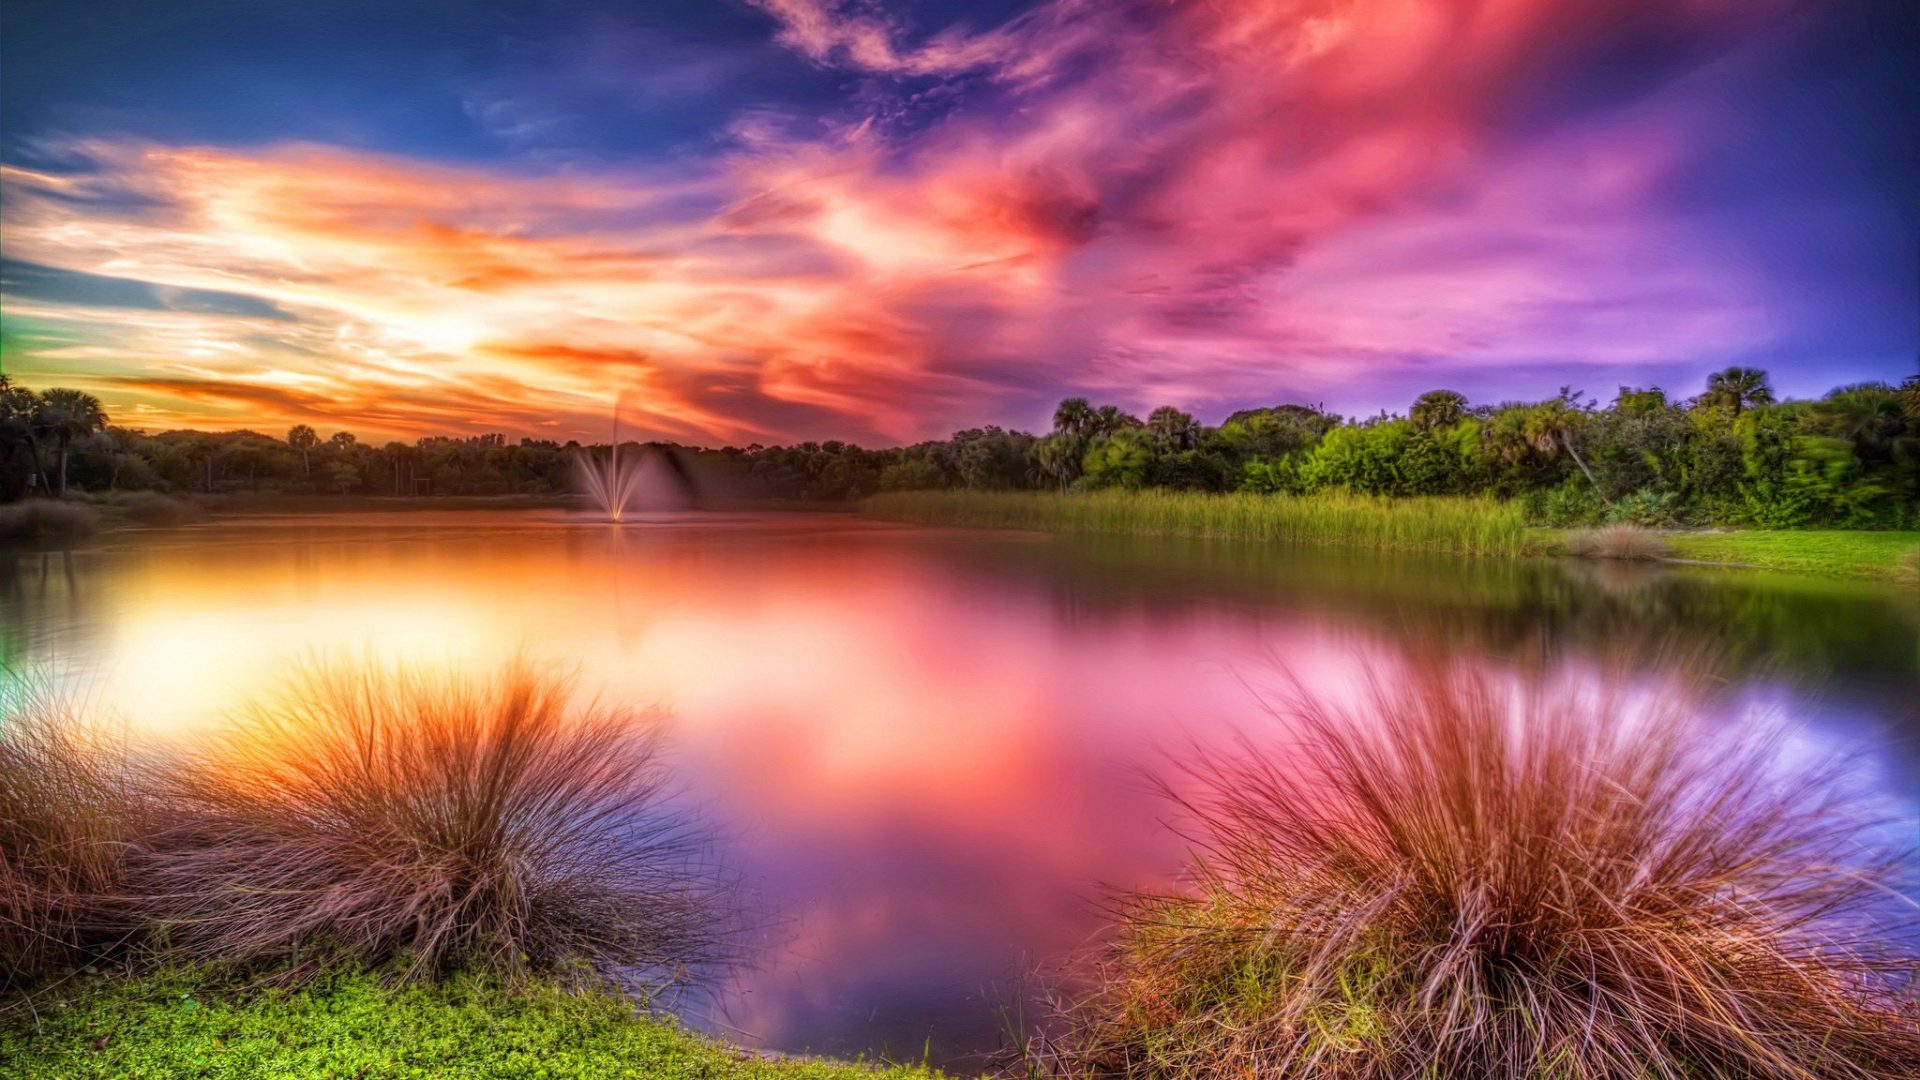 Sunset Vero Beach Colorful Grass Lake Glow Amazing - Vero Beach Sunsets , HD Wallpaper & Backgrounds